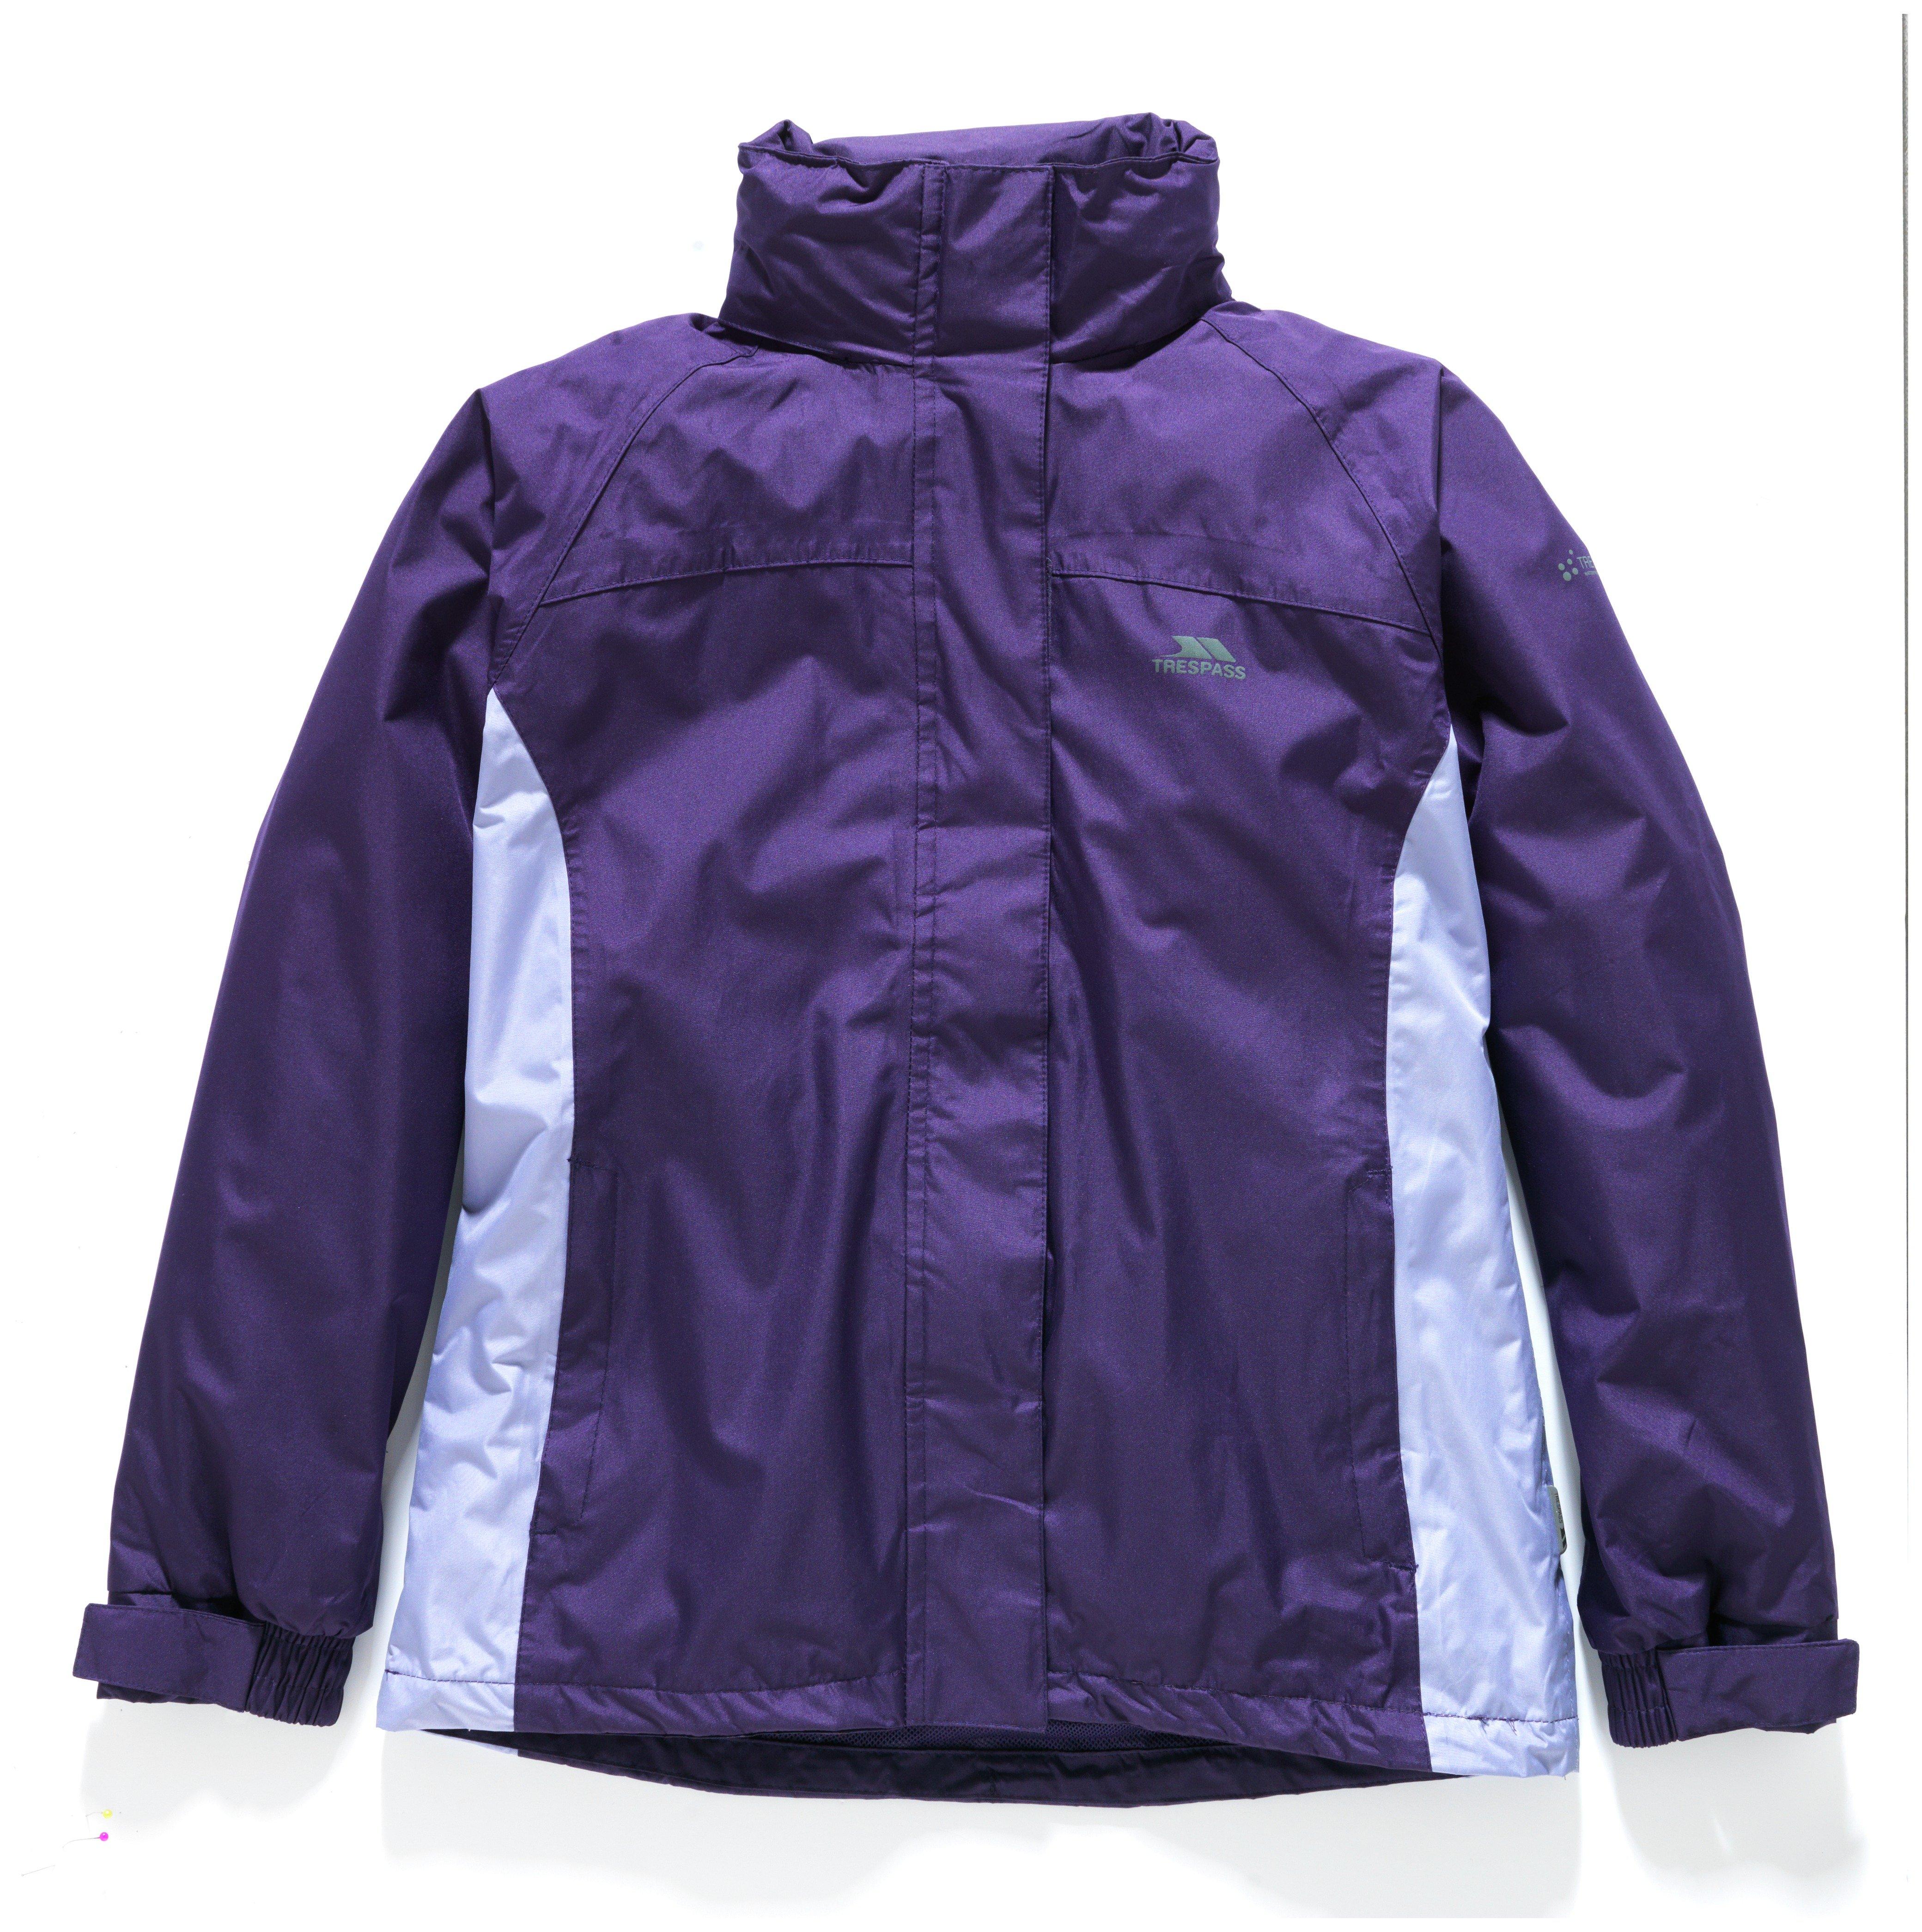 Image of Trespass Purple Waterproof Jacket - Extra Large